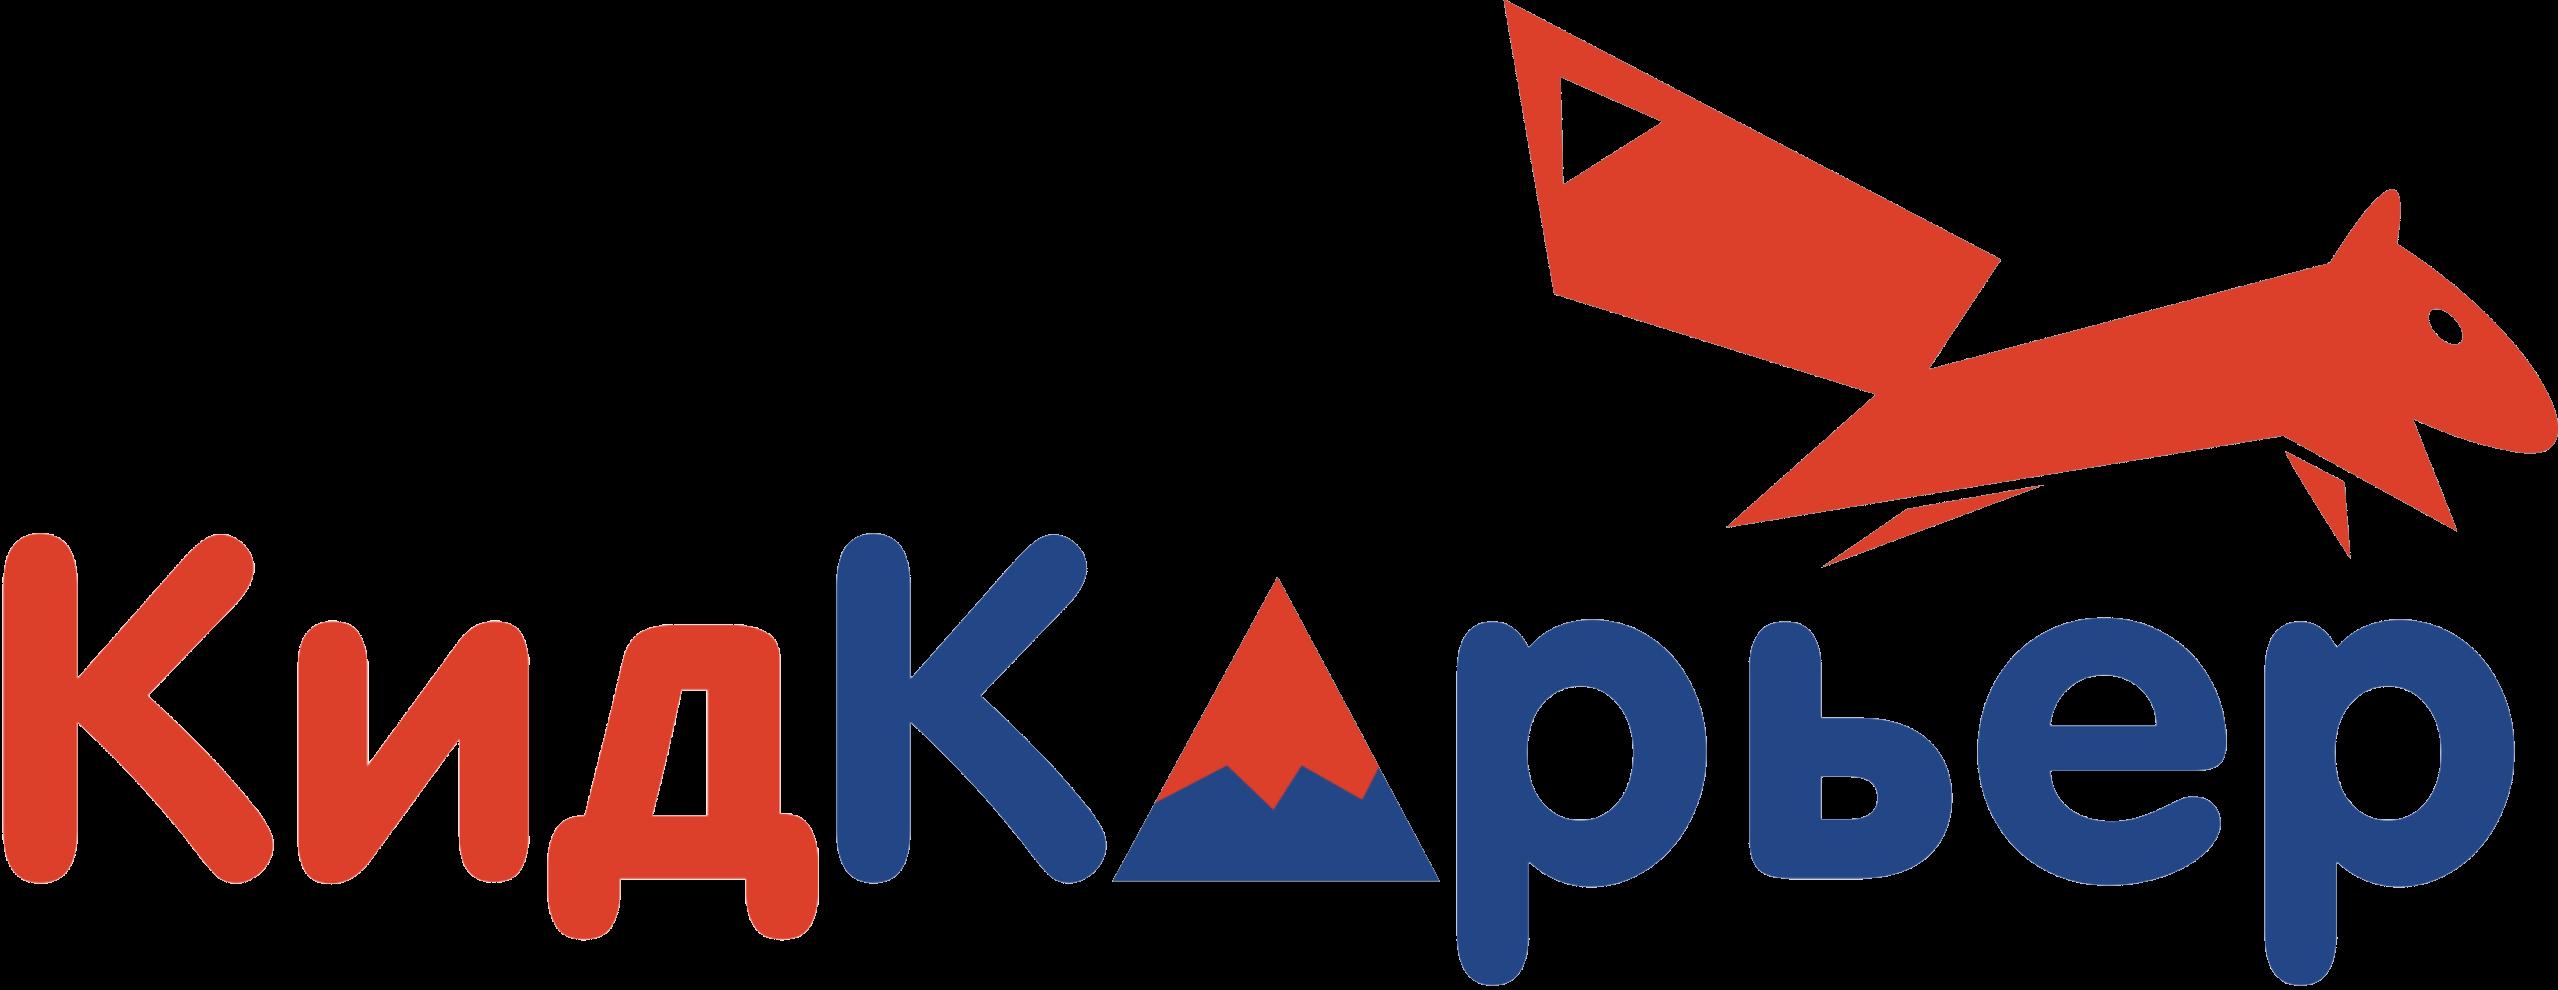 KidCareer - школа детского блогинга